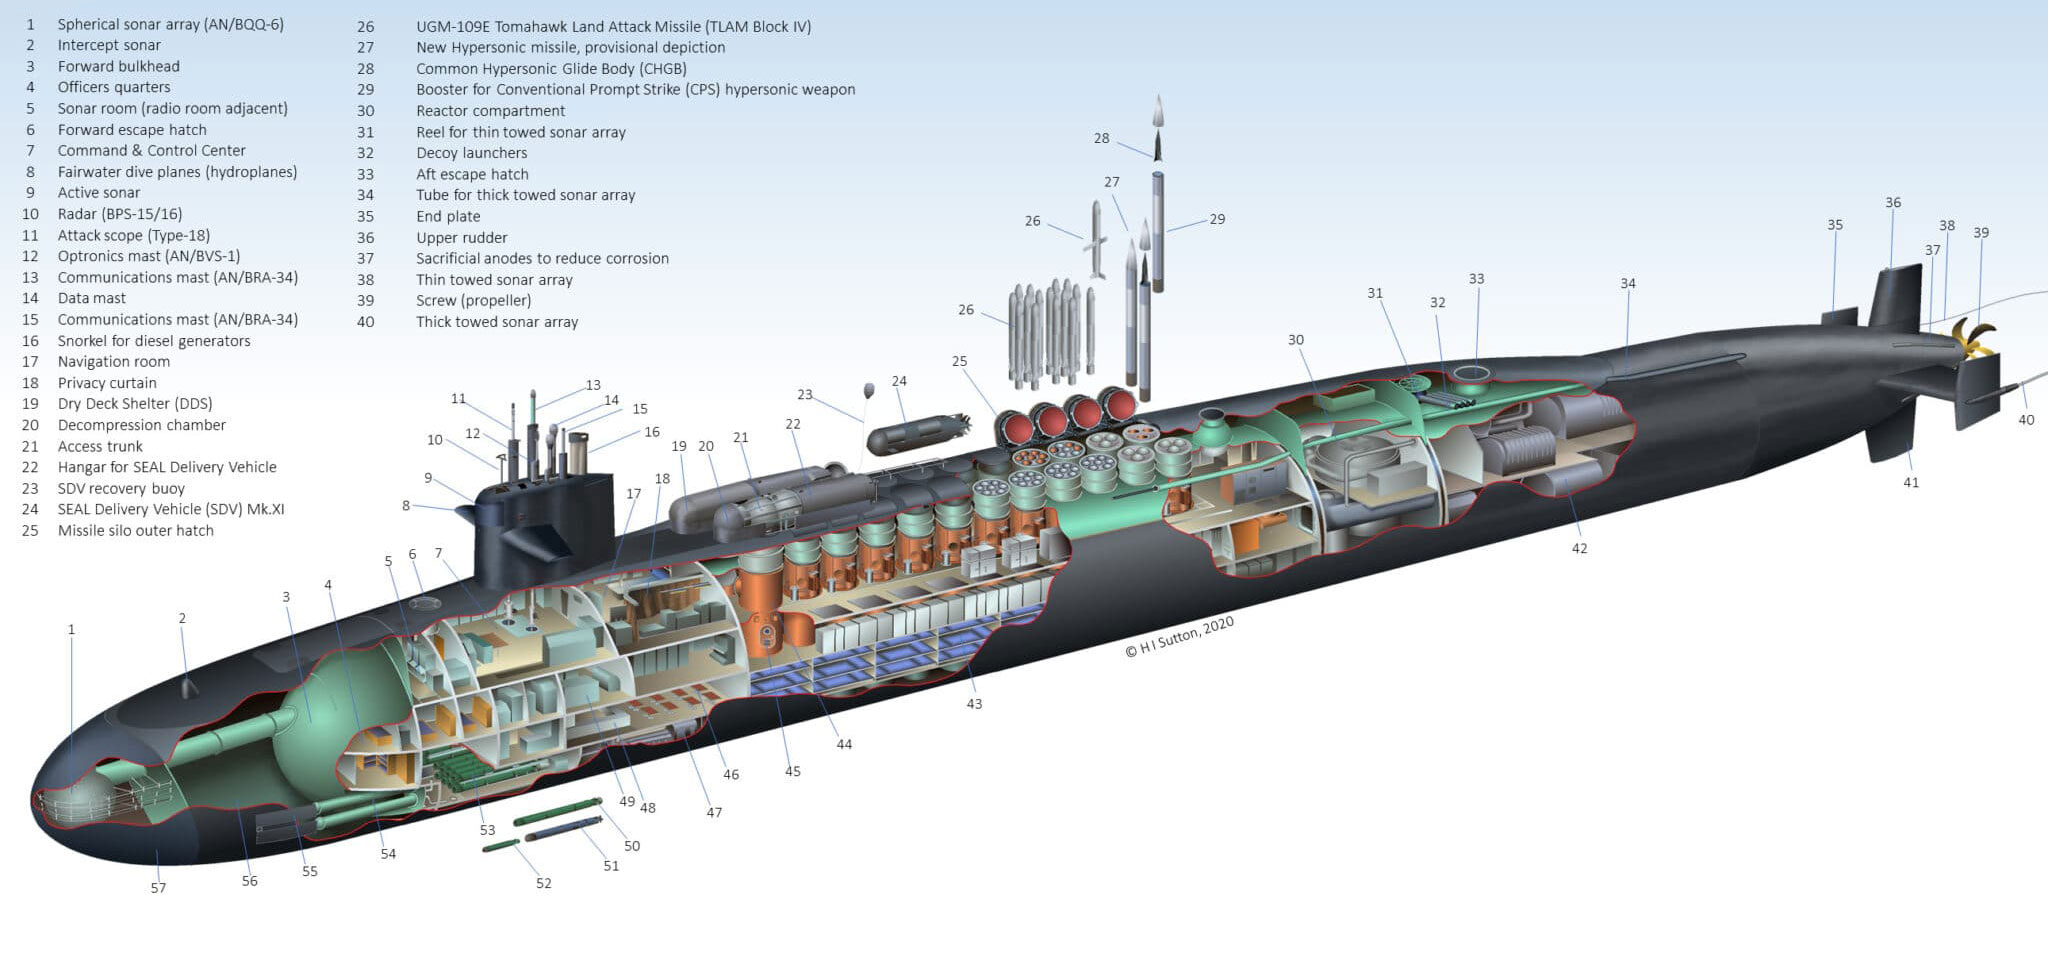 Ohio-class submarine cutaway drawing